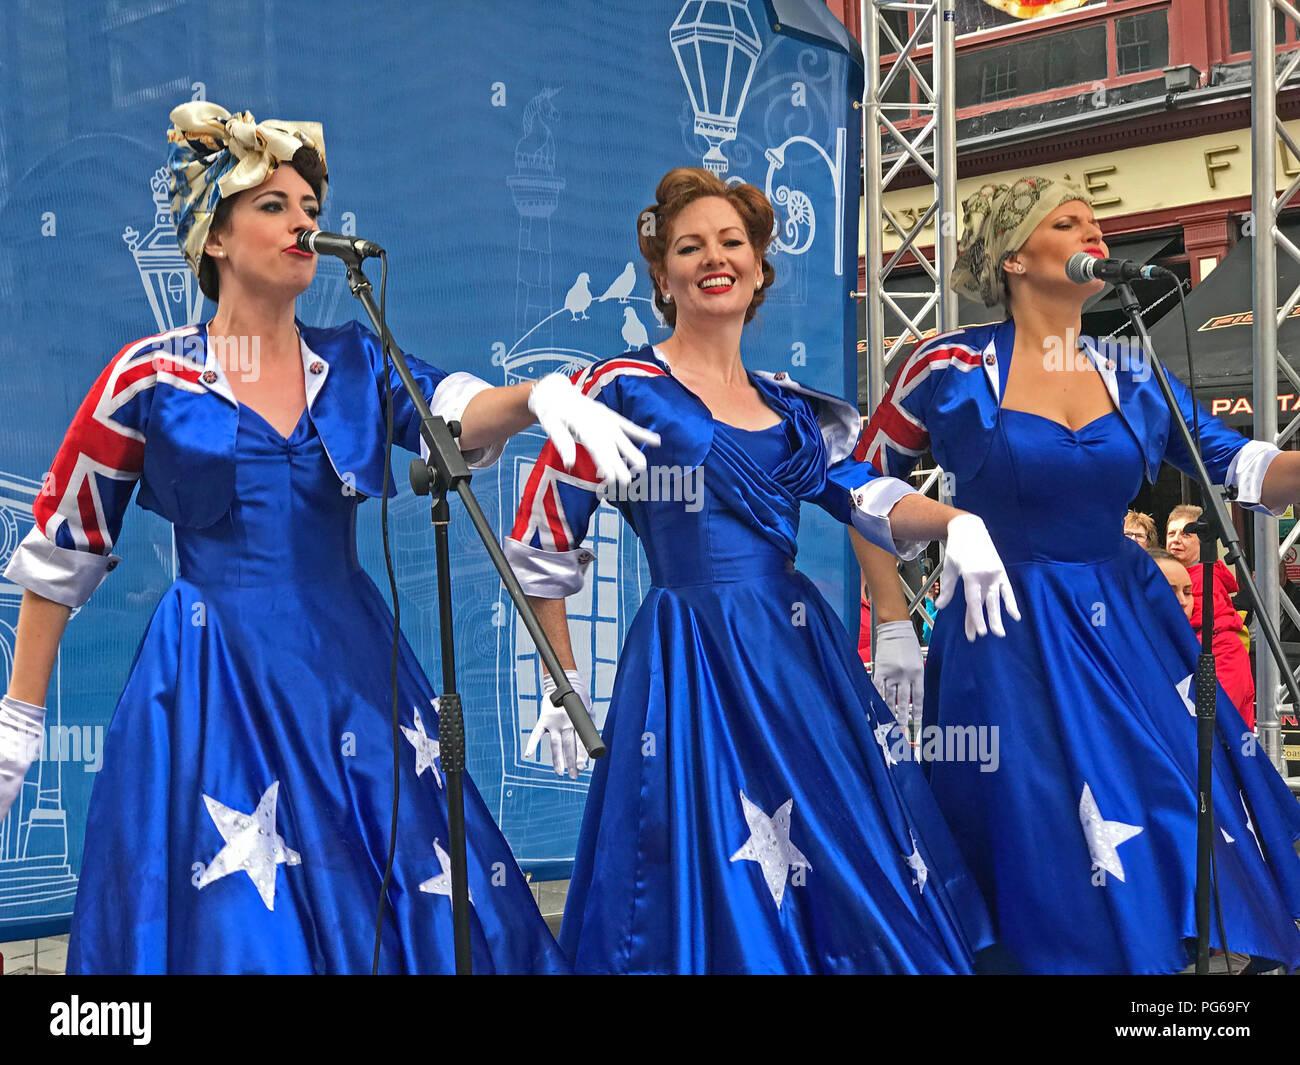 @Hotpixuk,Edinburgh Festival,fringe,city centre,Scotland,August 2018,2018,GoTonySmith,Australia,Fringe On The Mile,High St,UK,capital,females,lady,ladies,from,dancer,dancers,street entertainment,Edinburgh Royal Mile,virgin,sponsorship,sponsored,theSpace,Symposium Hotel,Venue 43,Venue43,The Space,thegirlsfromozgroup,thegirlsfromoz,sassy singing Sheilas,sassy,singing Sheilas,Aussie legends,Aussie,legends,Oz,classic Aussie songs